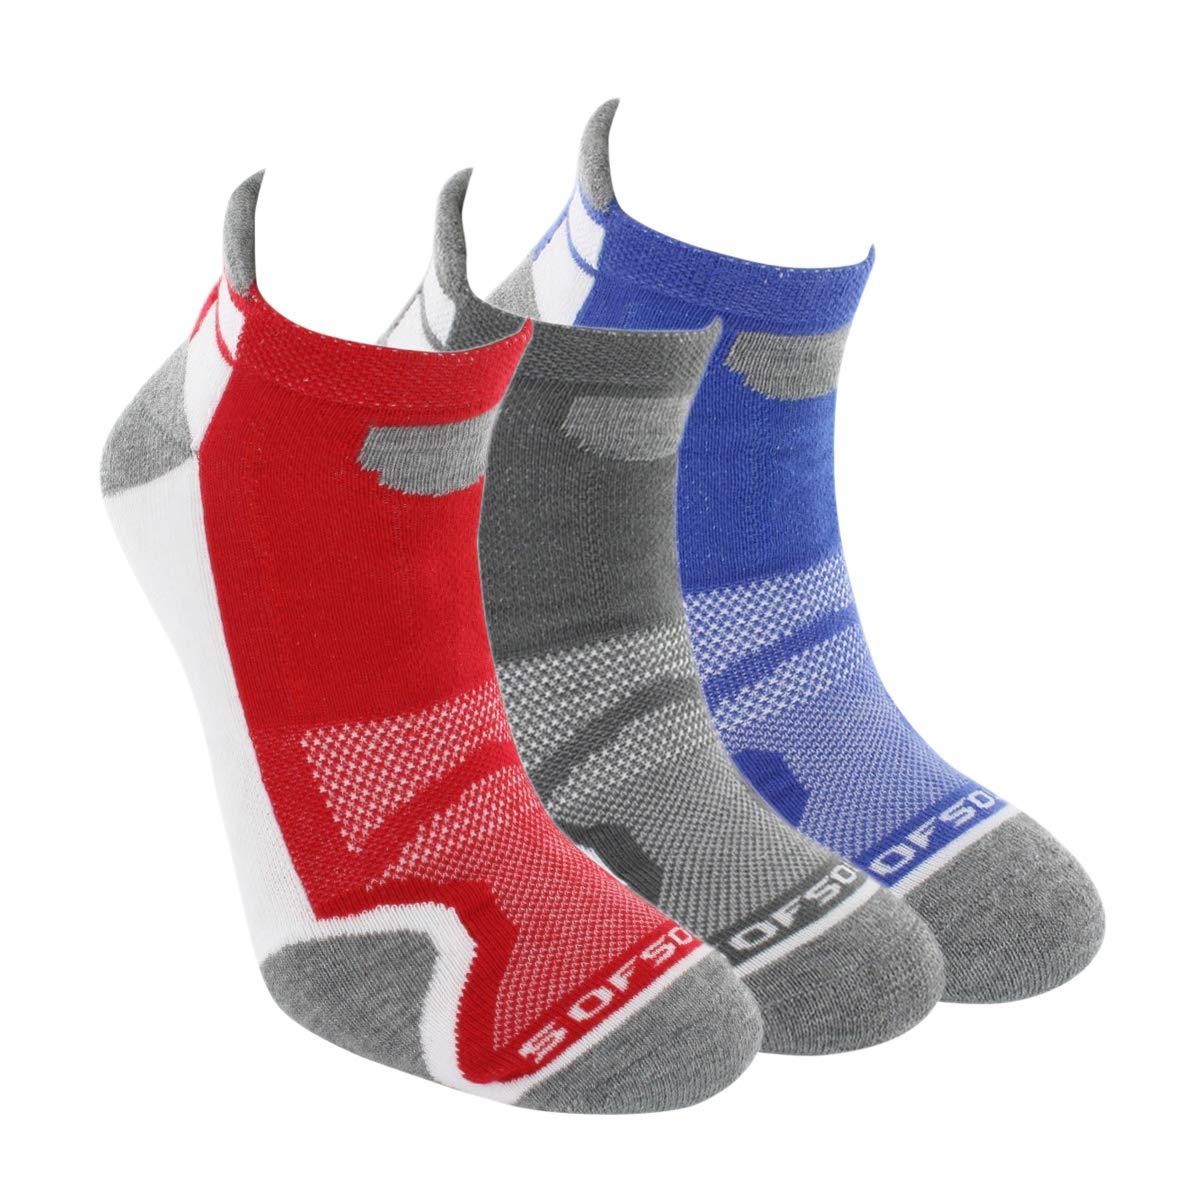 SofSole Socks Men's Multi Sport Cushion Low Cut, White Blue/Grey/Red, Size 8-11 29747